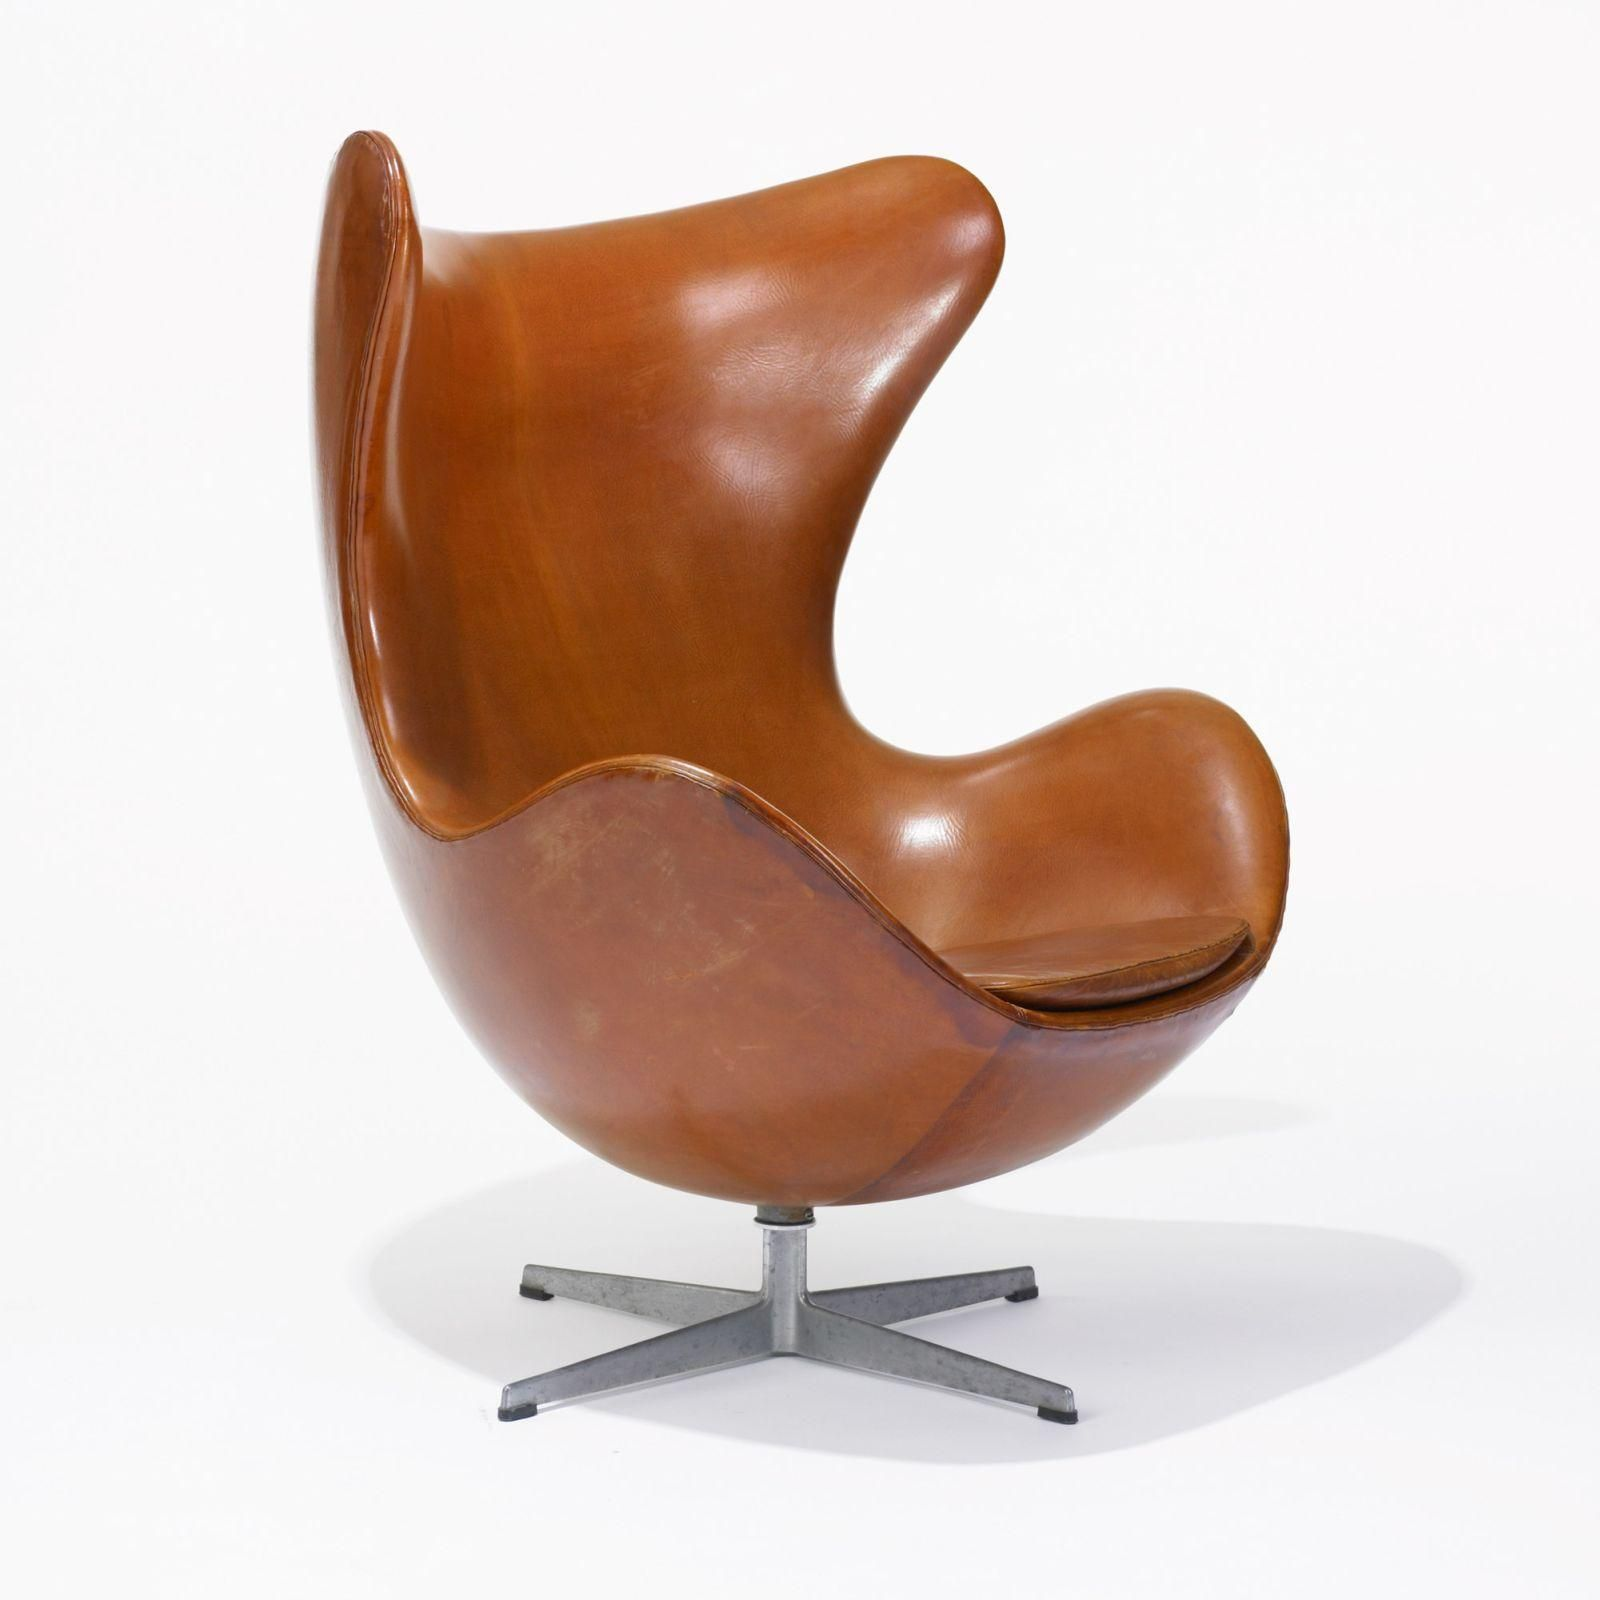 arne jacobsen the egg chair model 3316 cuir cognac. ed: fritz hansen